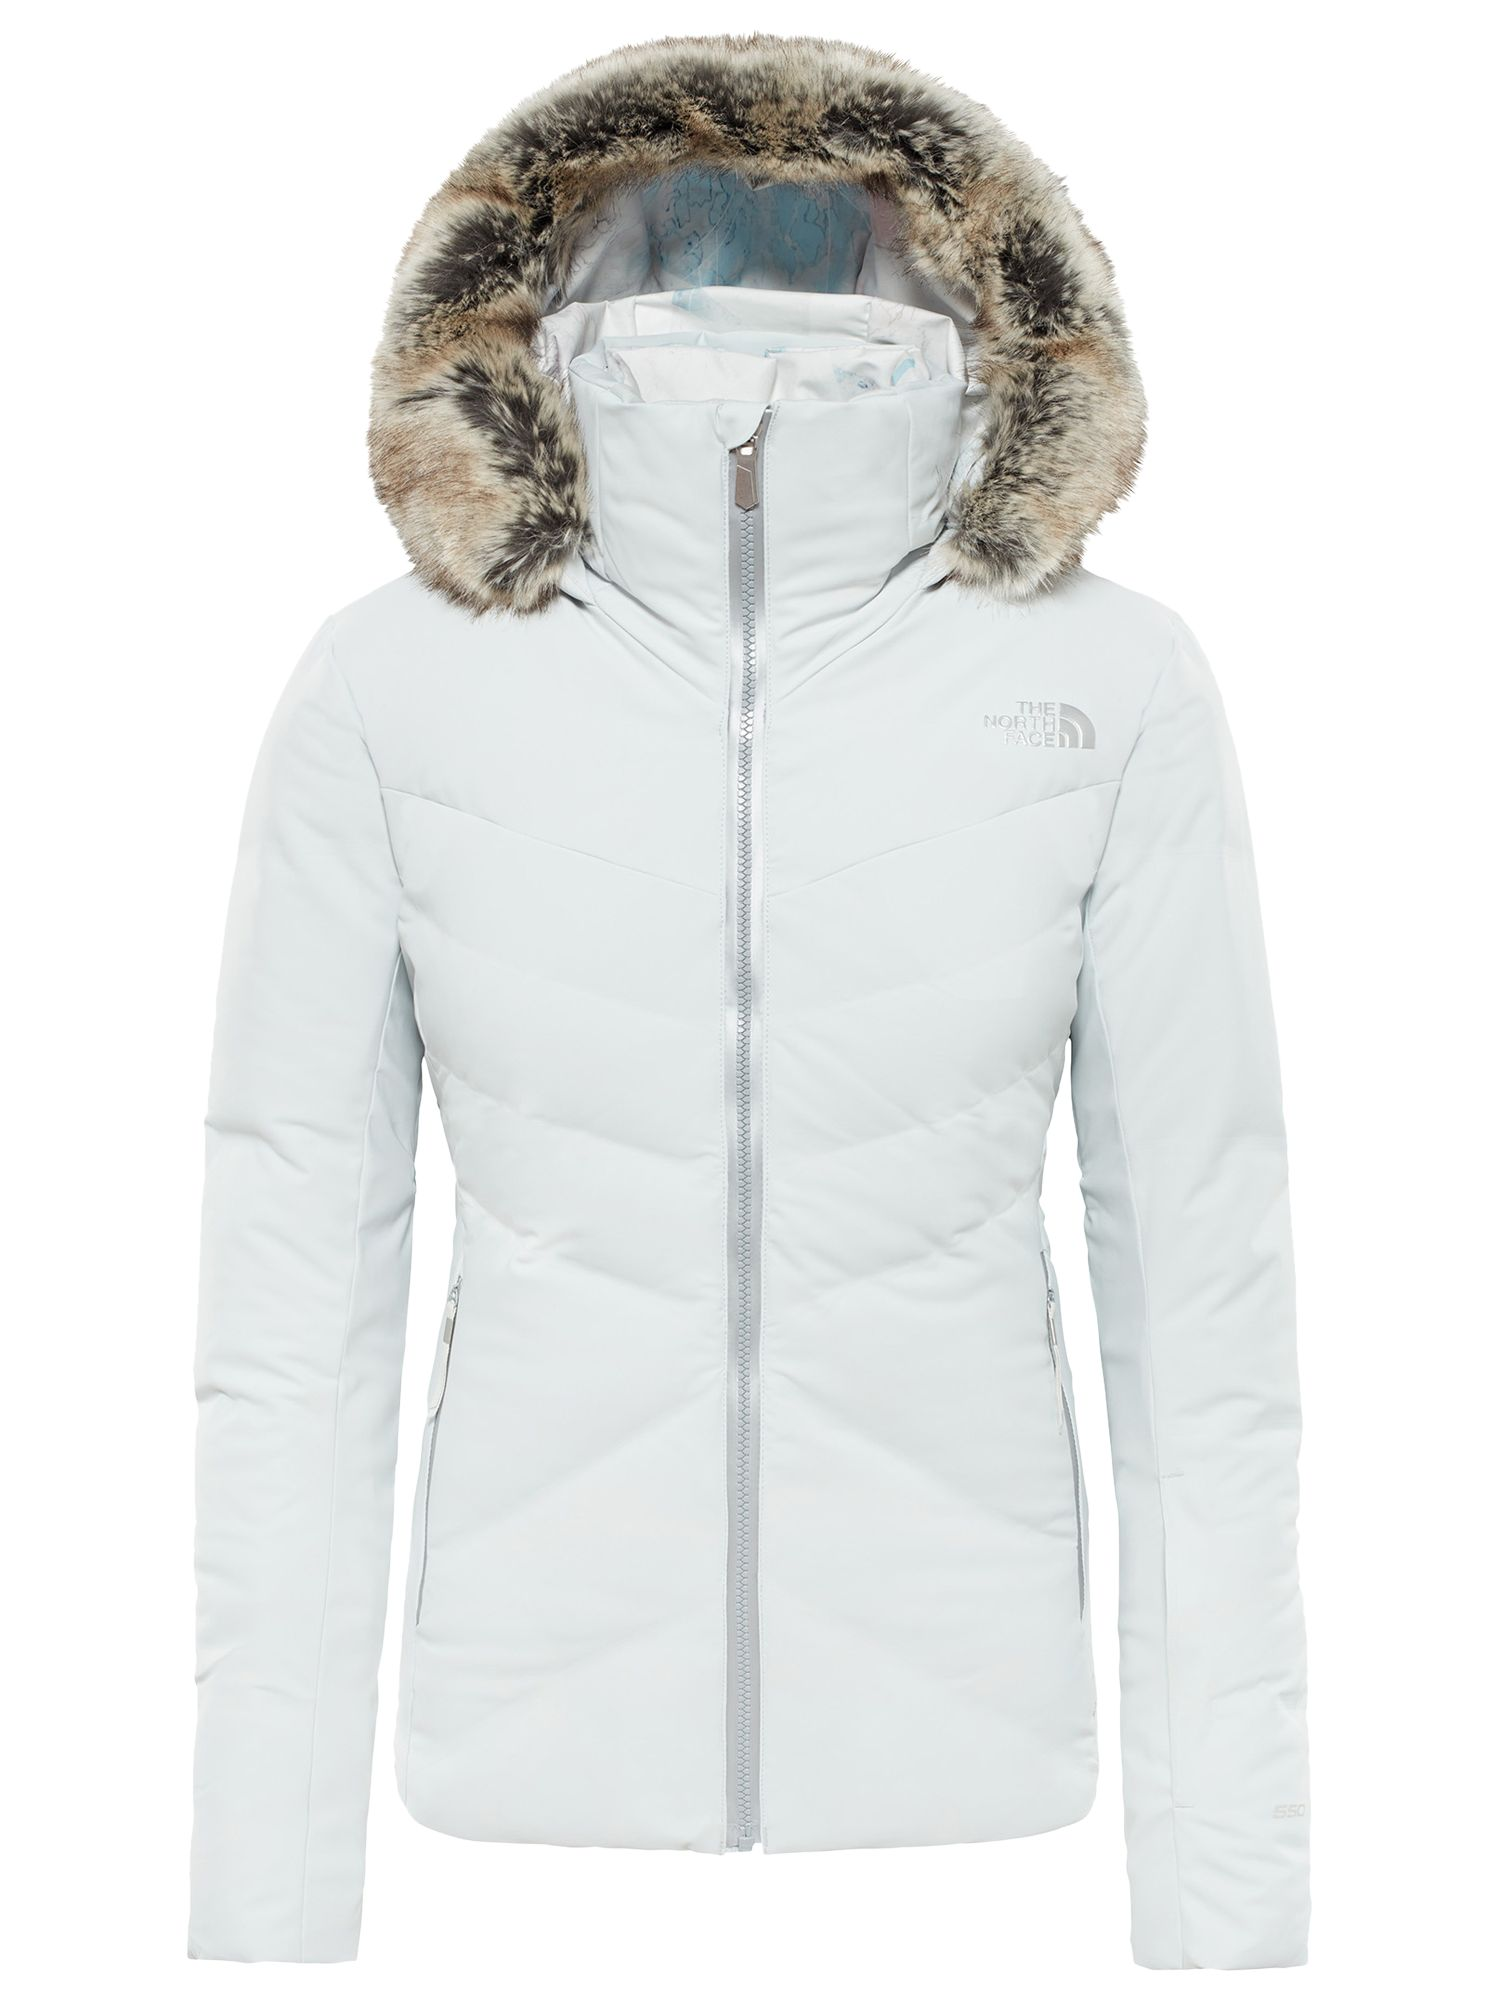 3665ccefb The North Face Women's Cirque Down Ski Jacket, Tin Grey at John ...